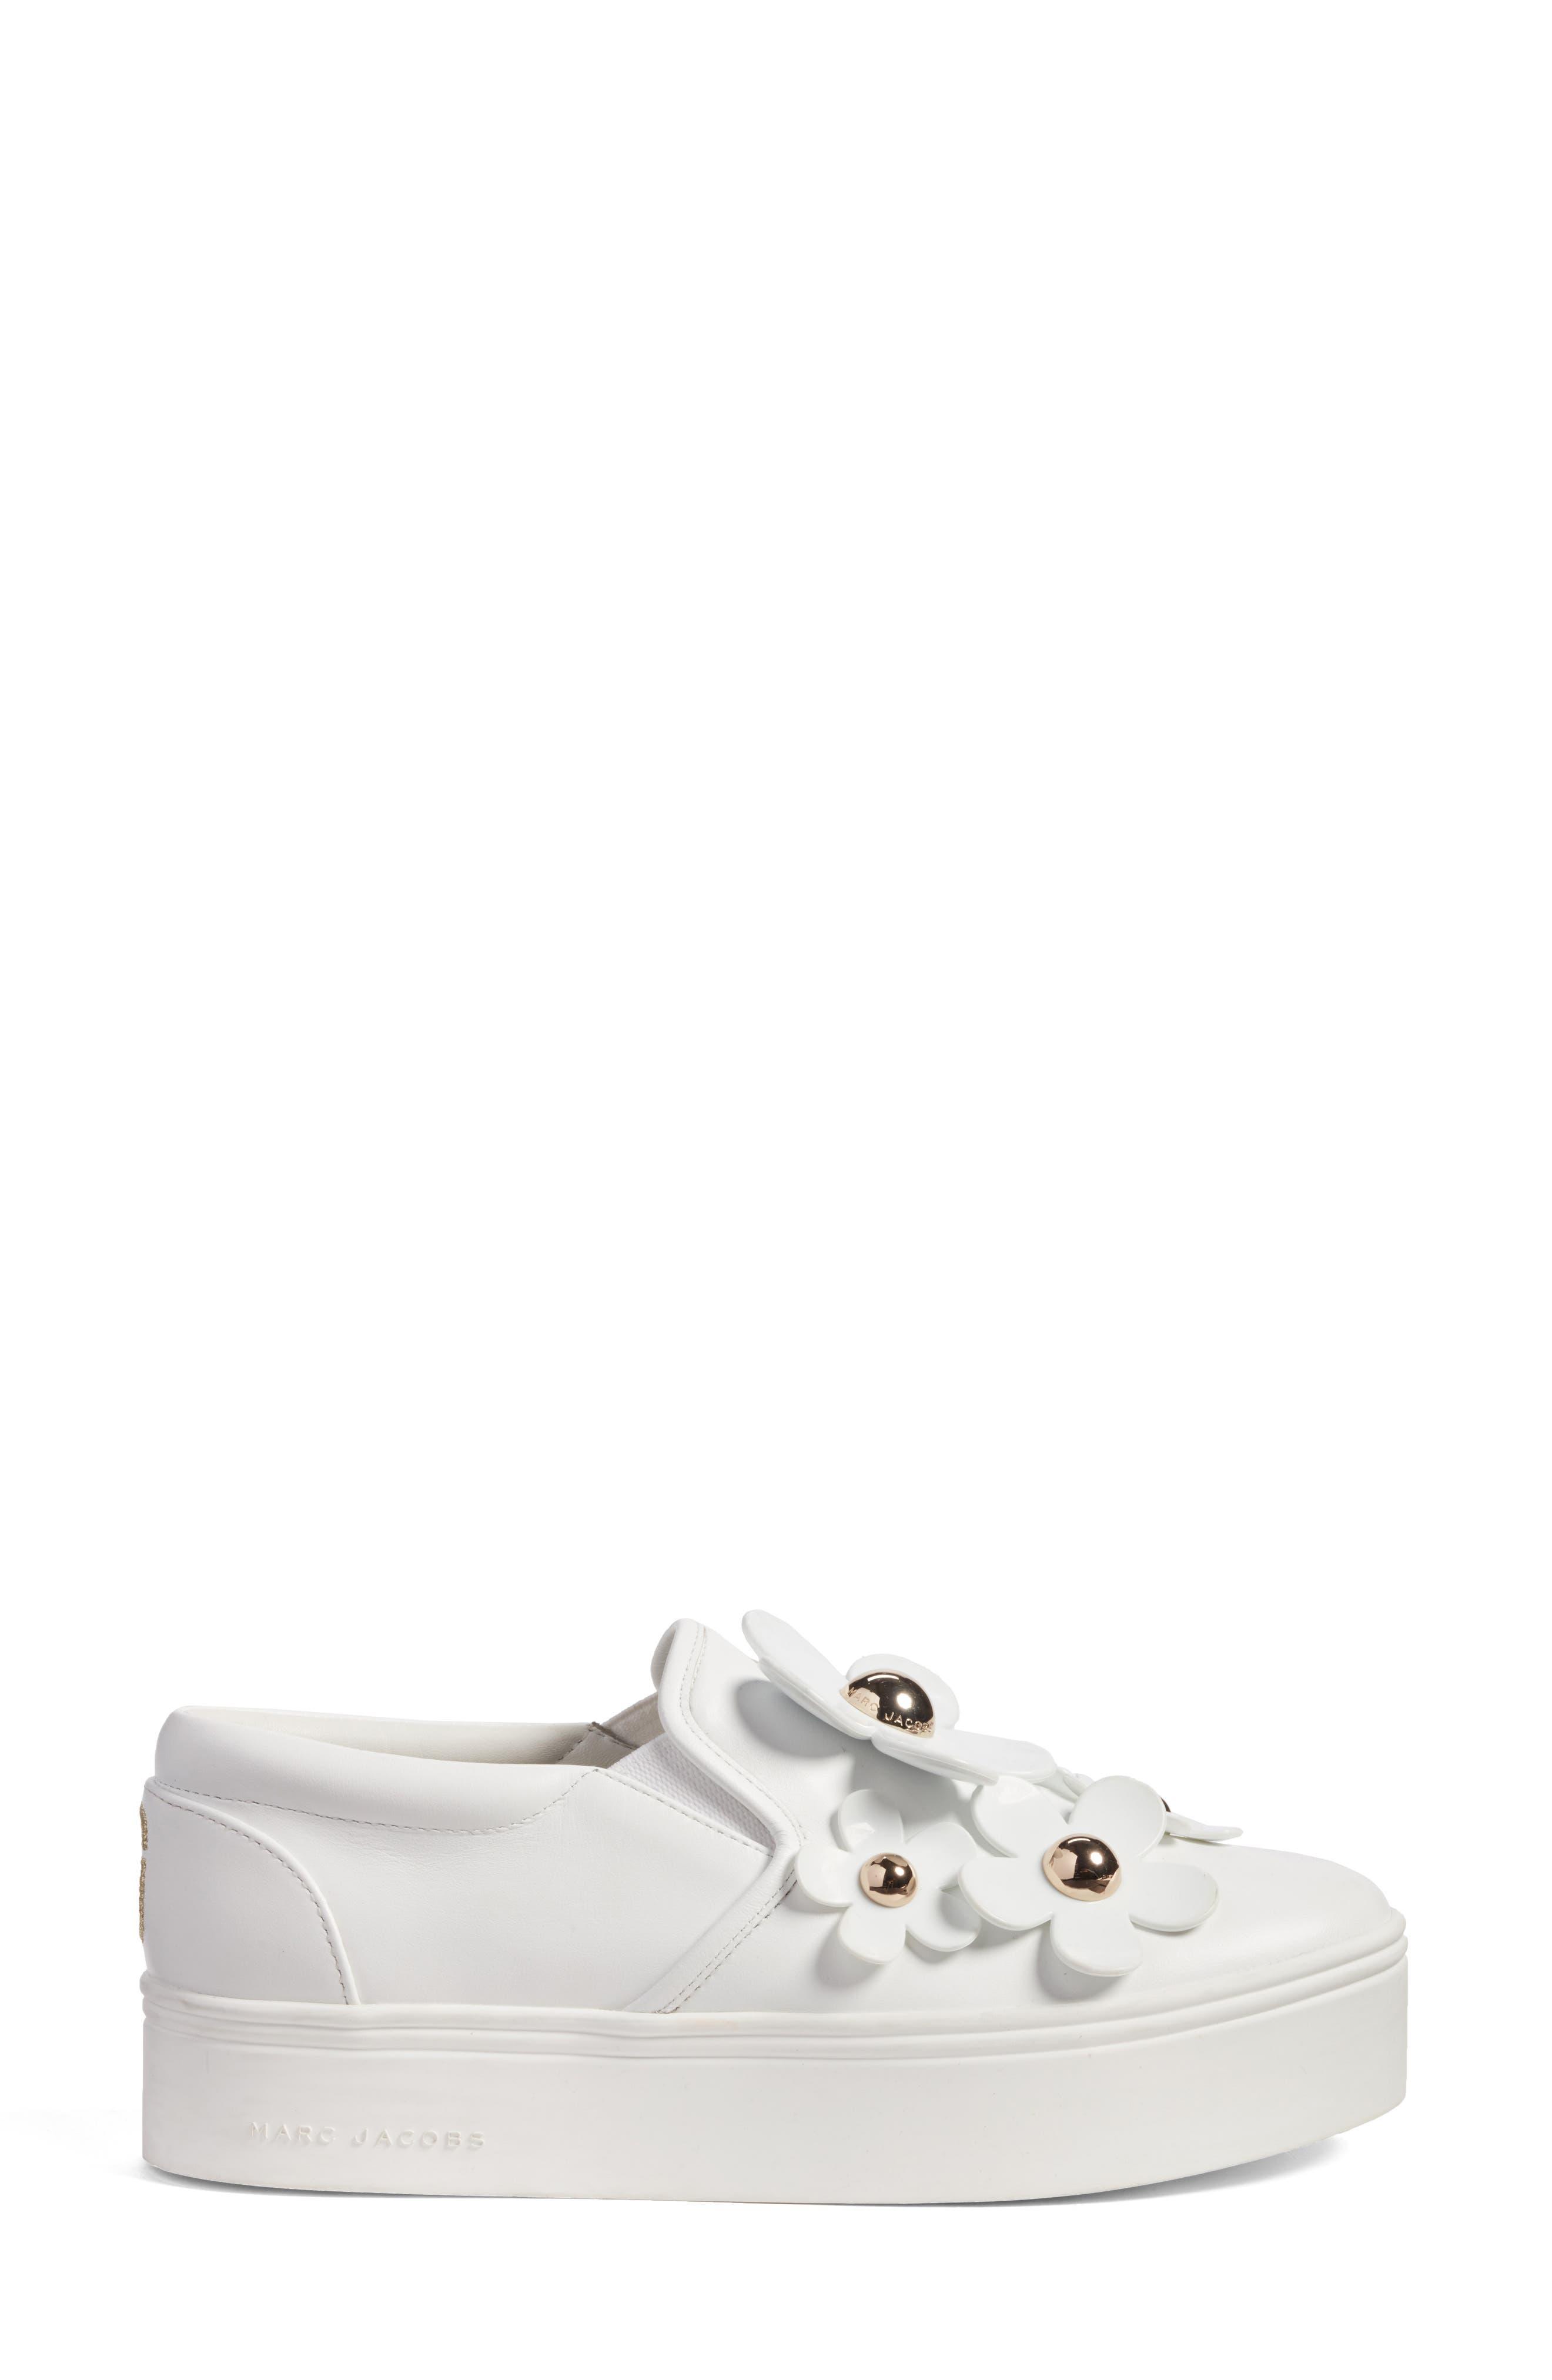 Alternate Image 3  - MARC JACOBS Platform Sneaker (Women)